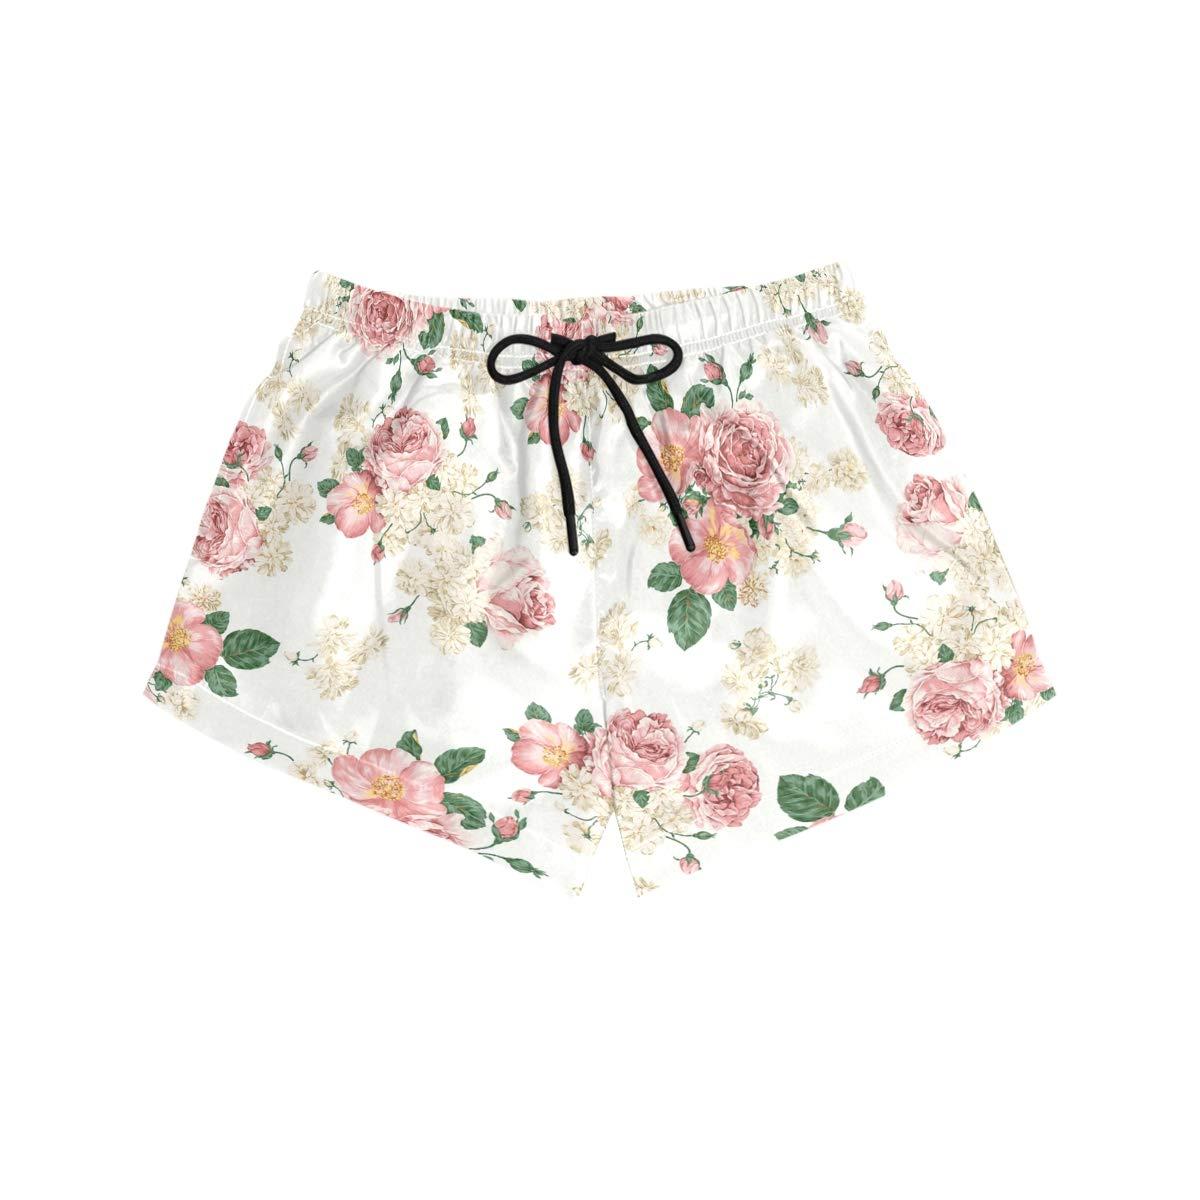 Lttedeng Womens Fashion Summer Rose Beach Shorts Casual Short Pants